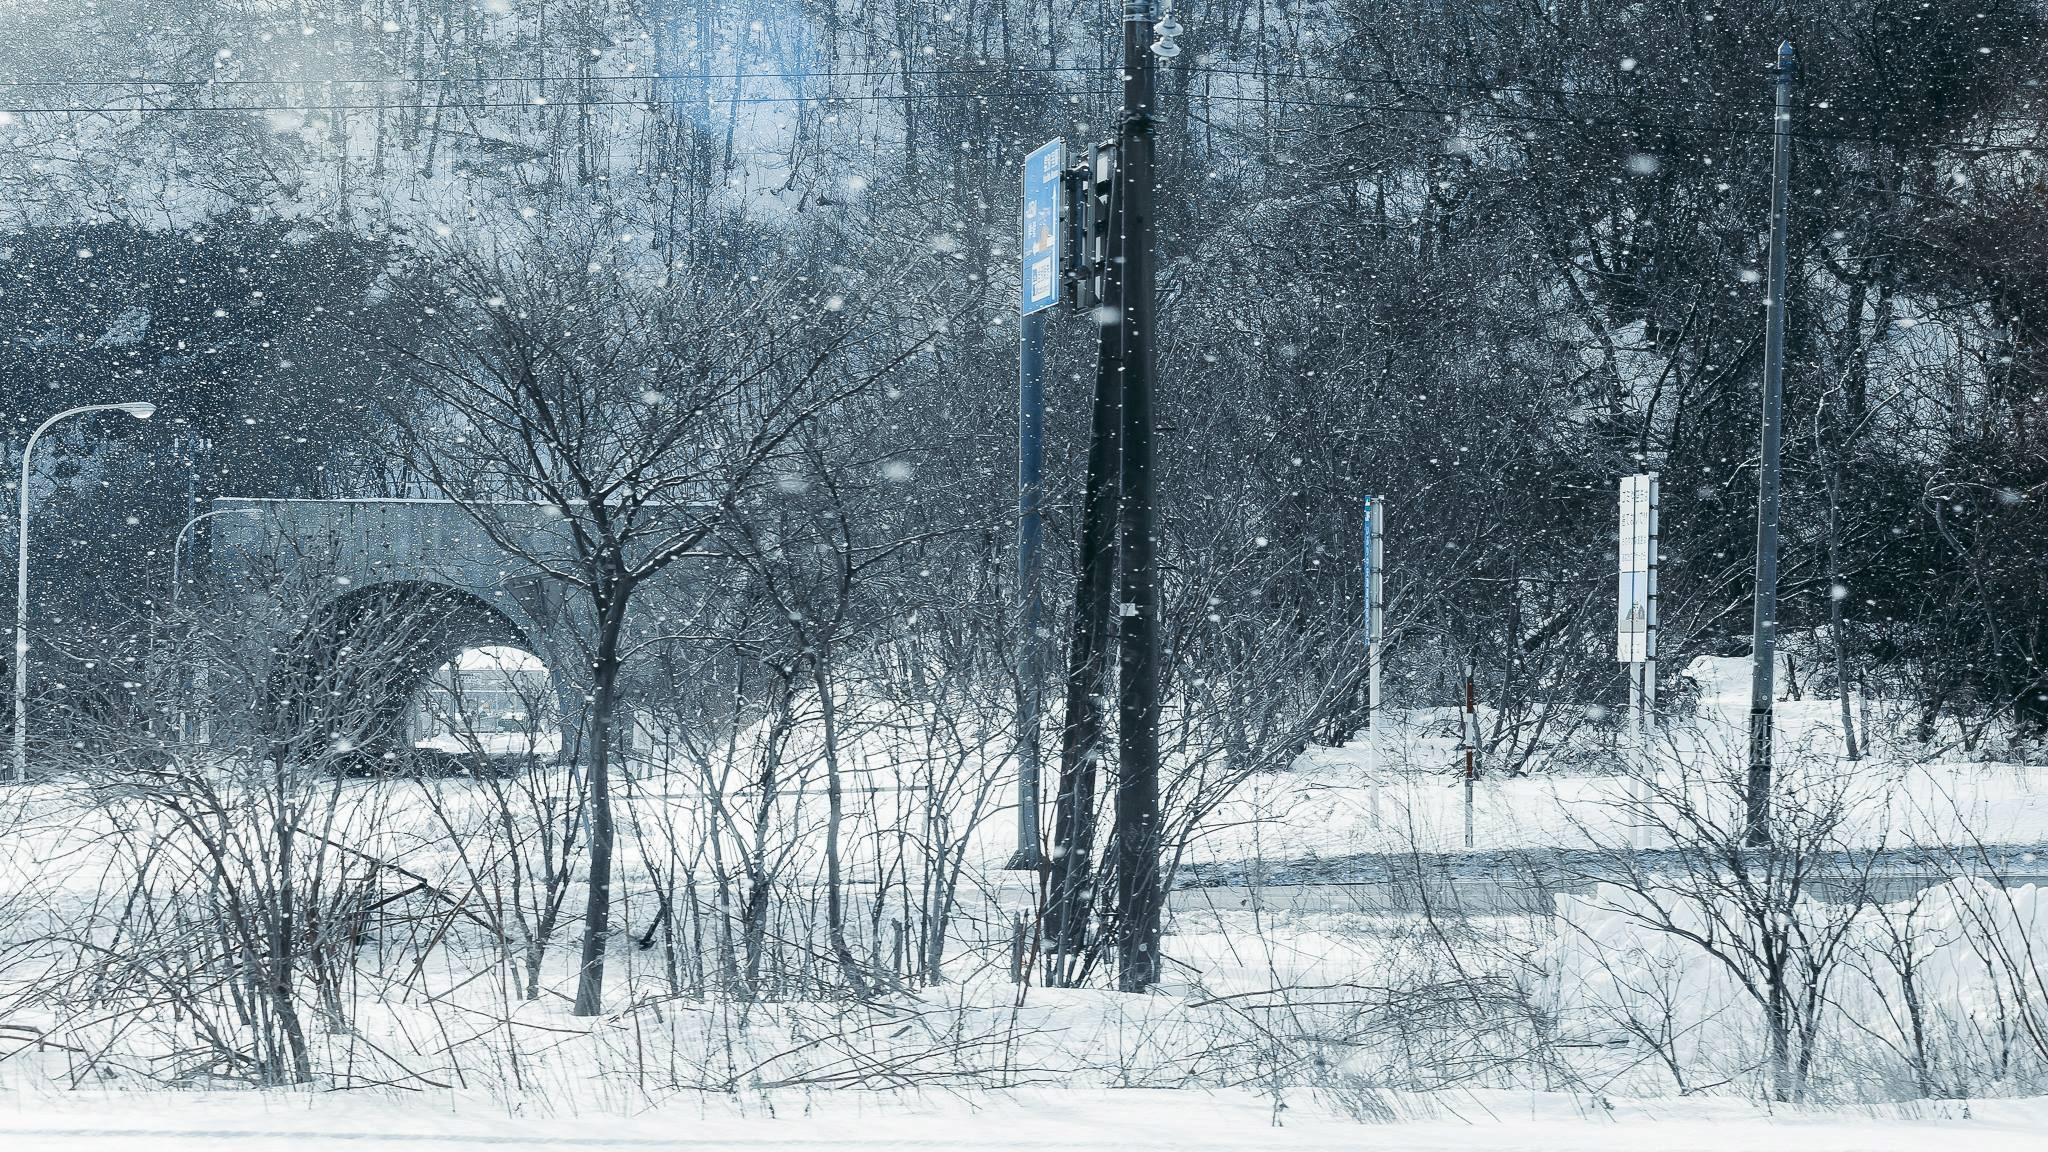 Hokkaido tuyet trang, noi dang den nhat mua dong o Nhat Ban hinh anh 2